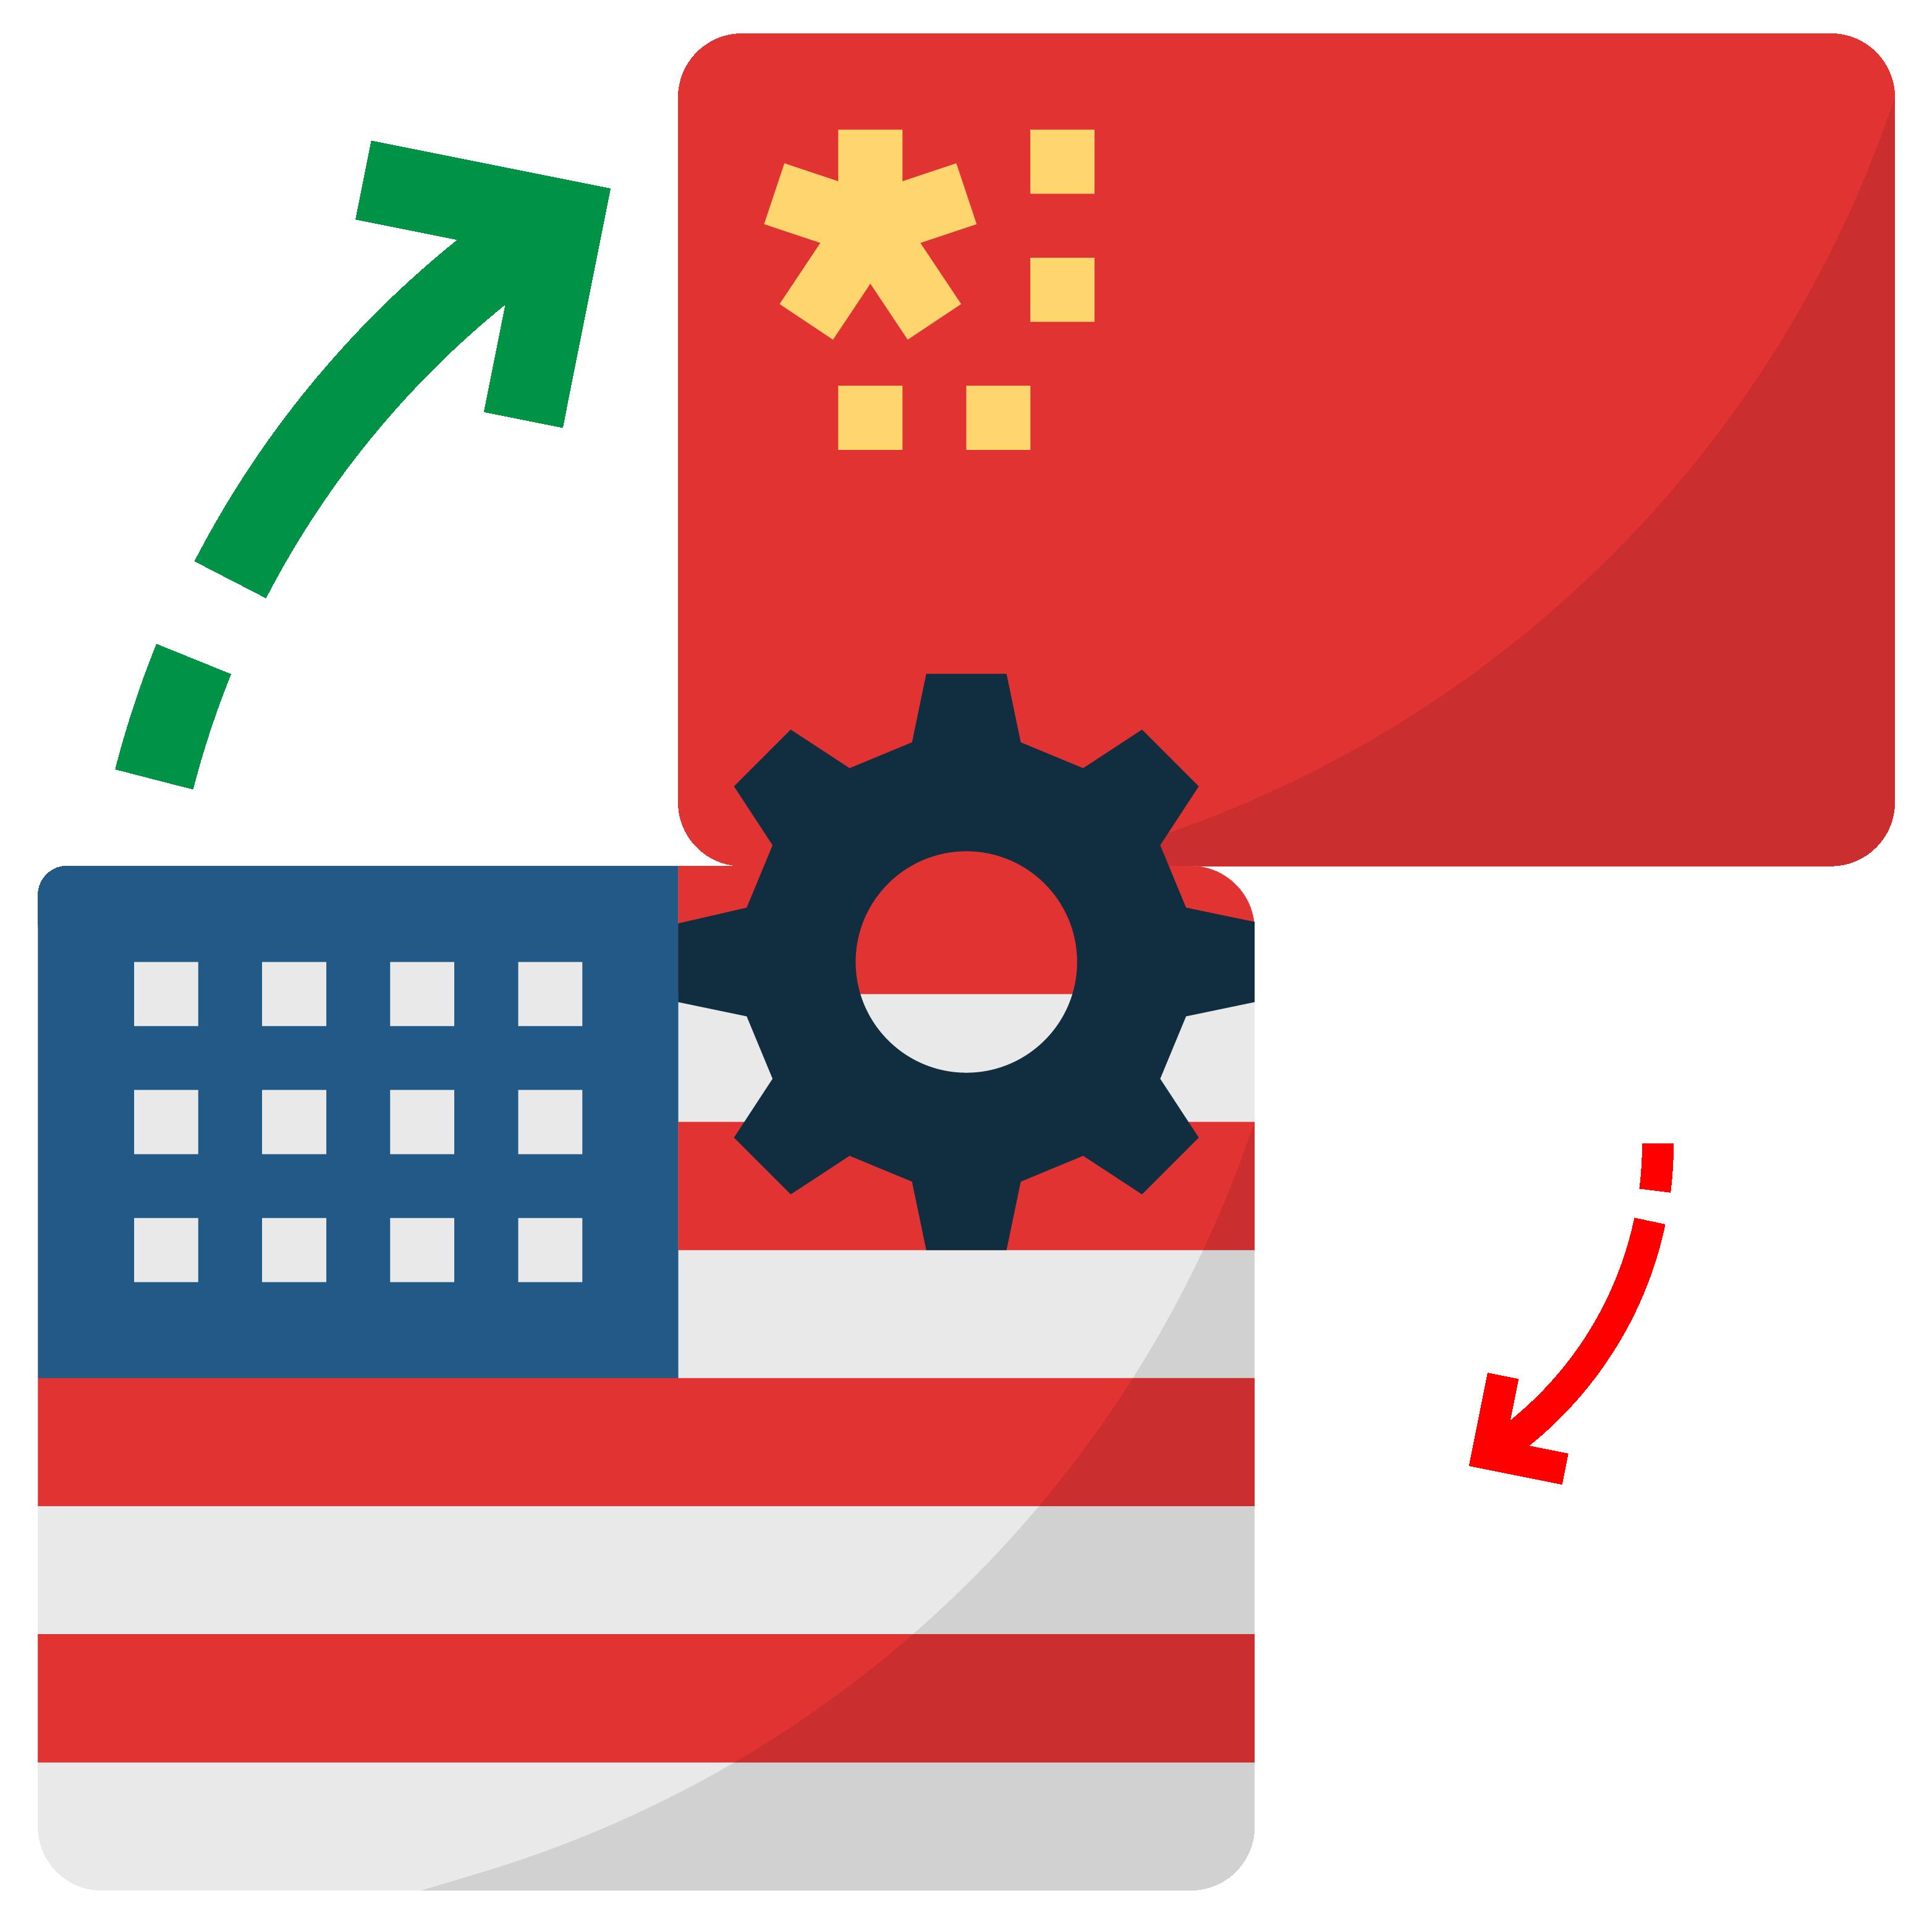 Newegg Floship US China trade Imbalance